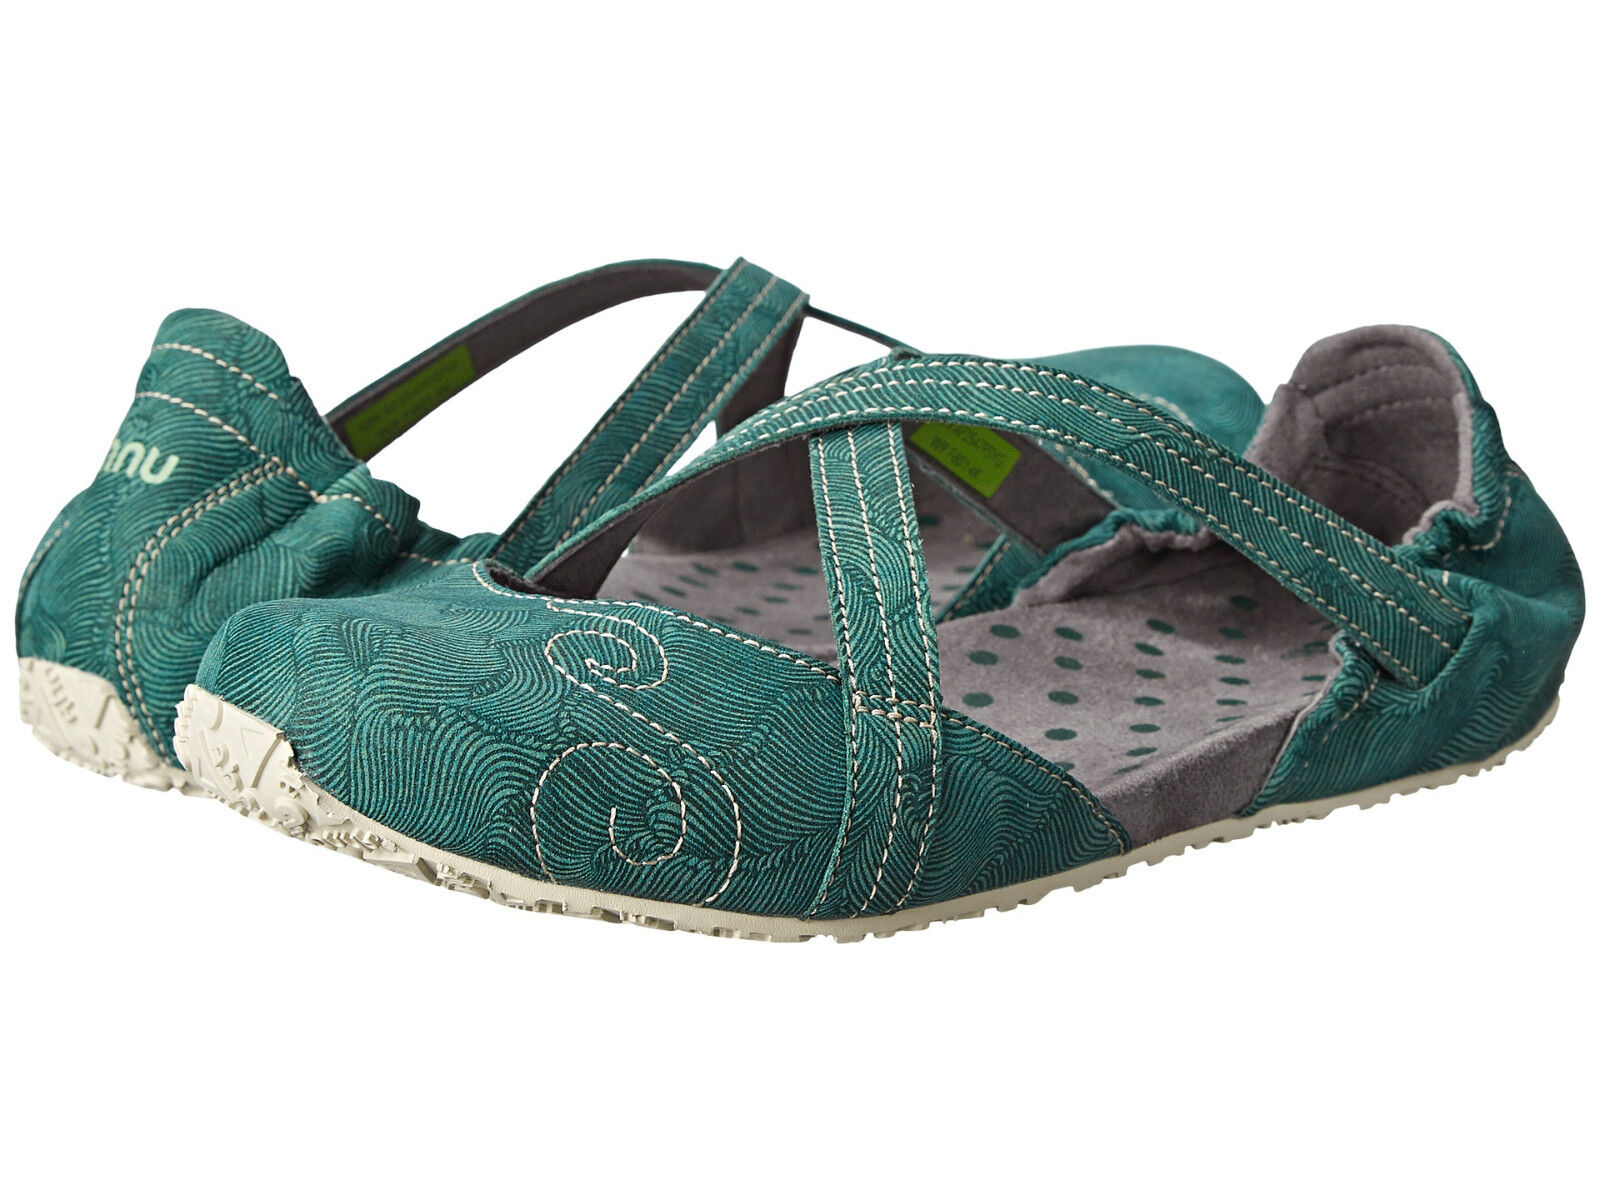 NEW Ahnu Good Karma SHOES Strappy Flats 6 37 Green Vegan Leather $95 Retail